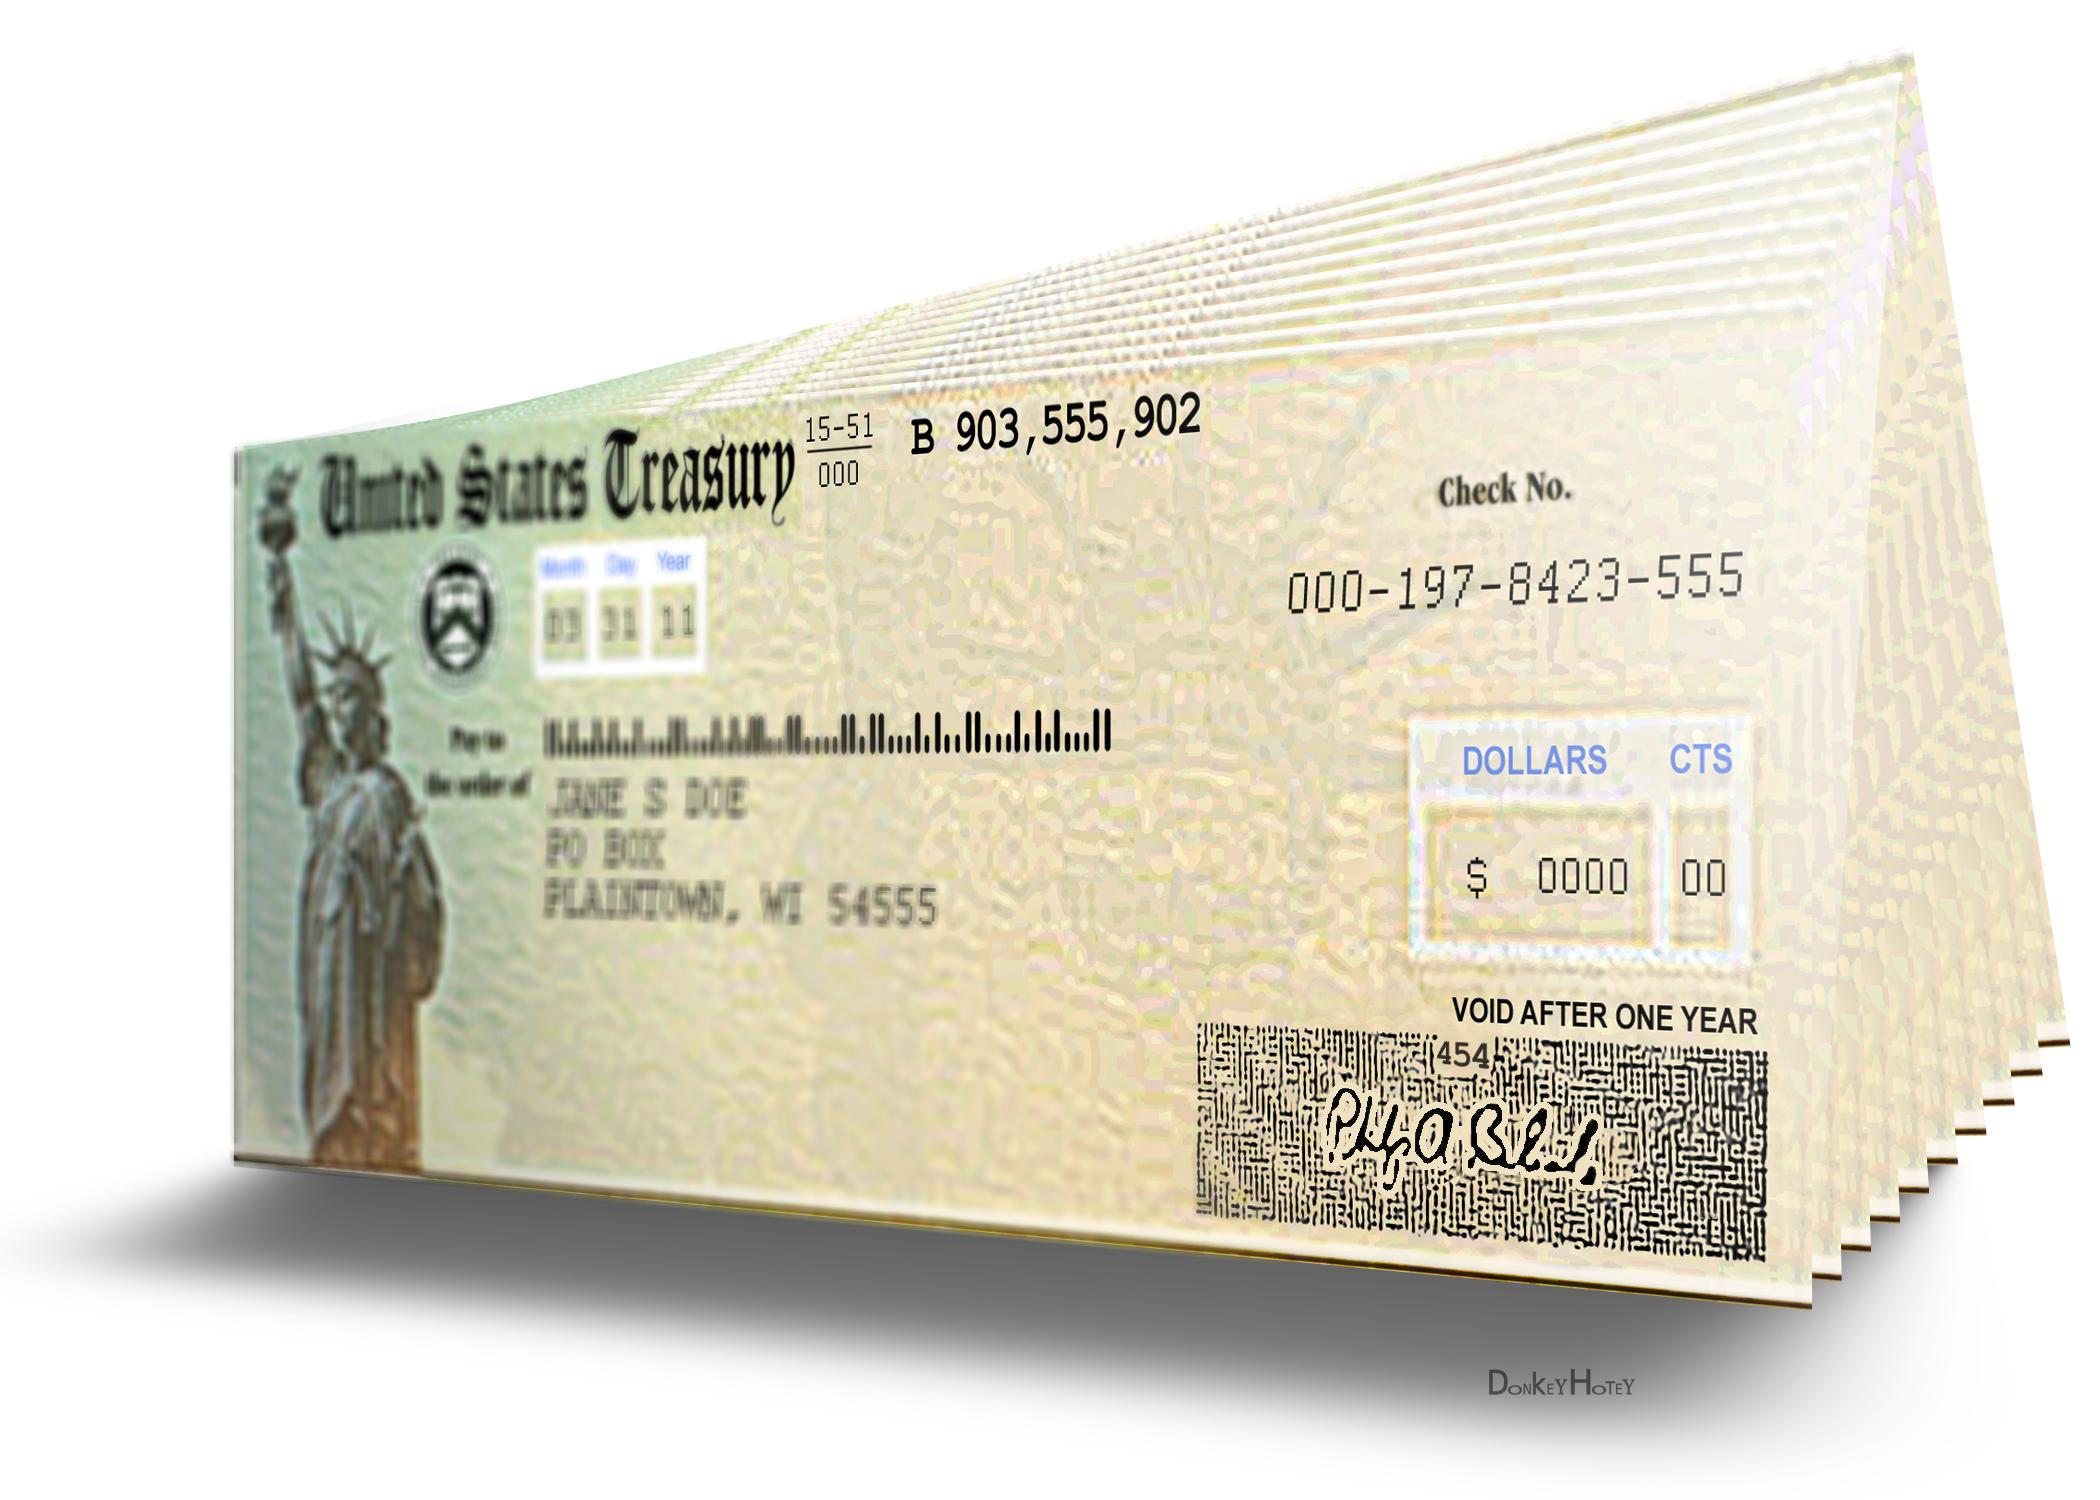 How Many Allowances Should I Claim On My W4 The Motley Fool